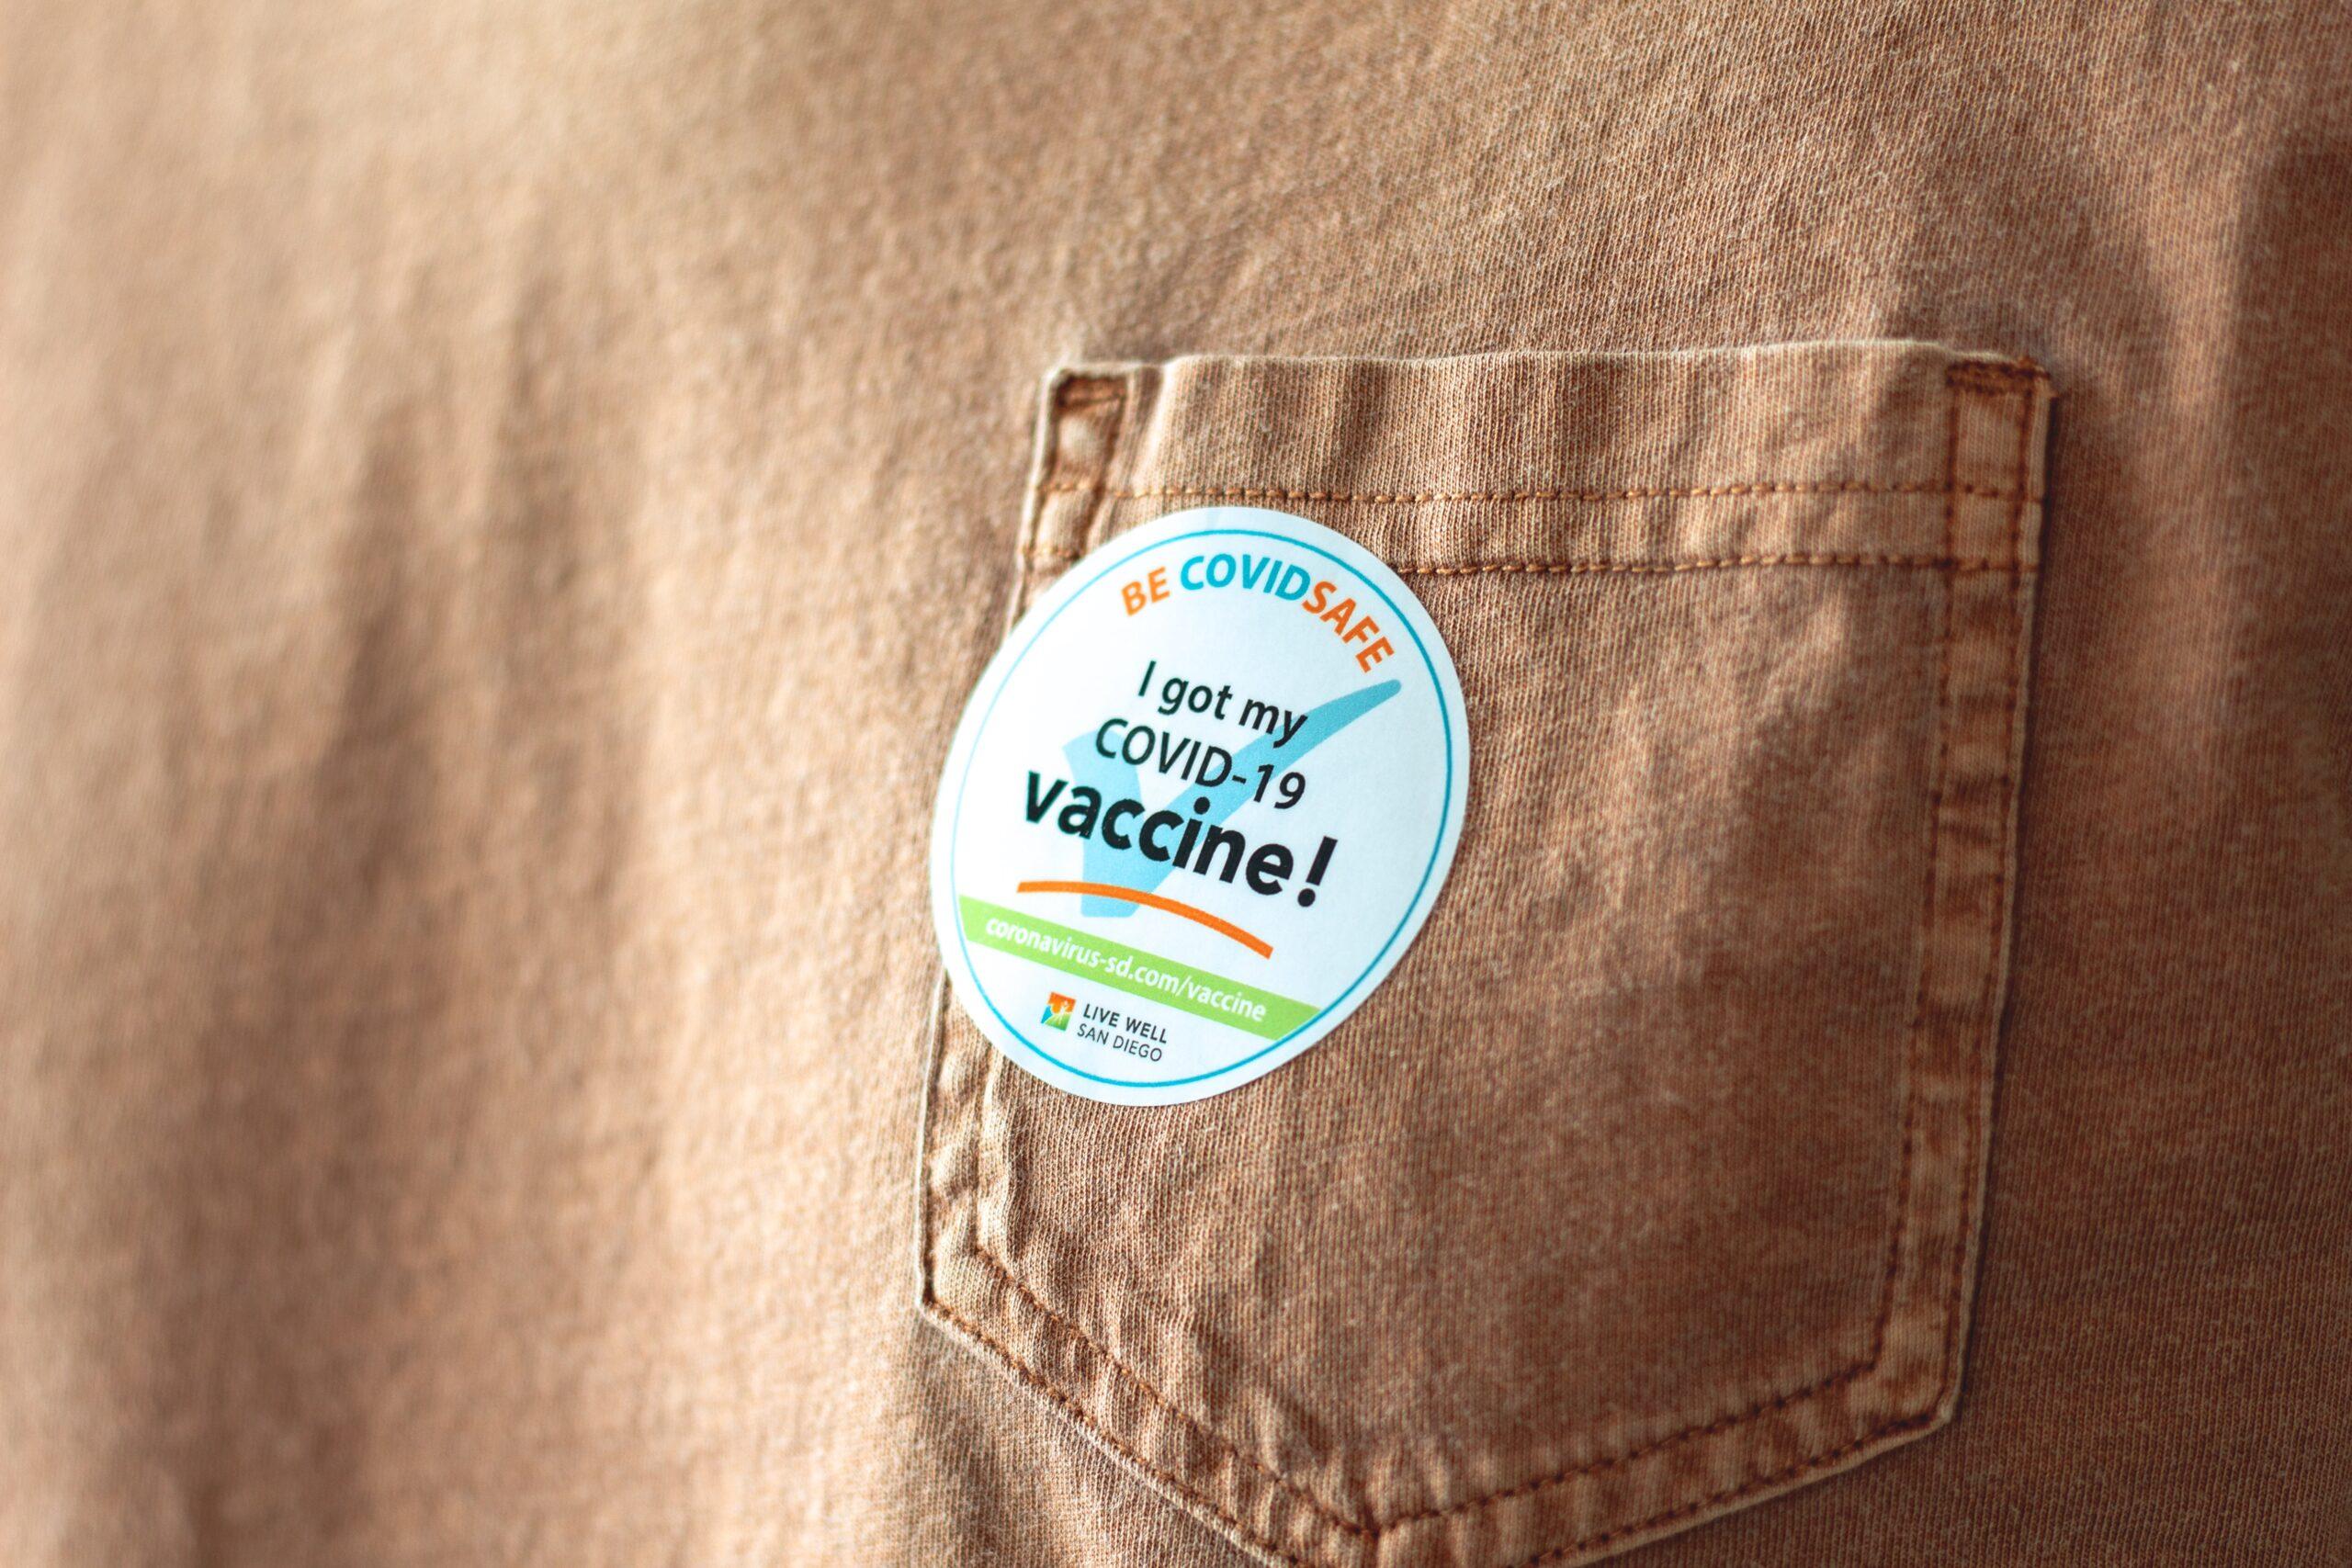 Person with a COVID-19 vaccination sticker